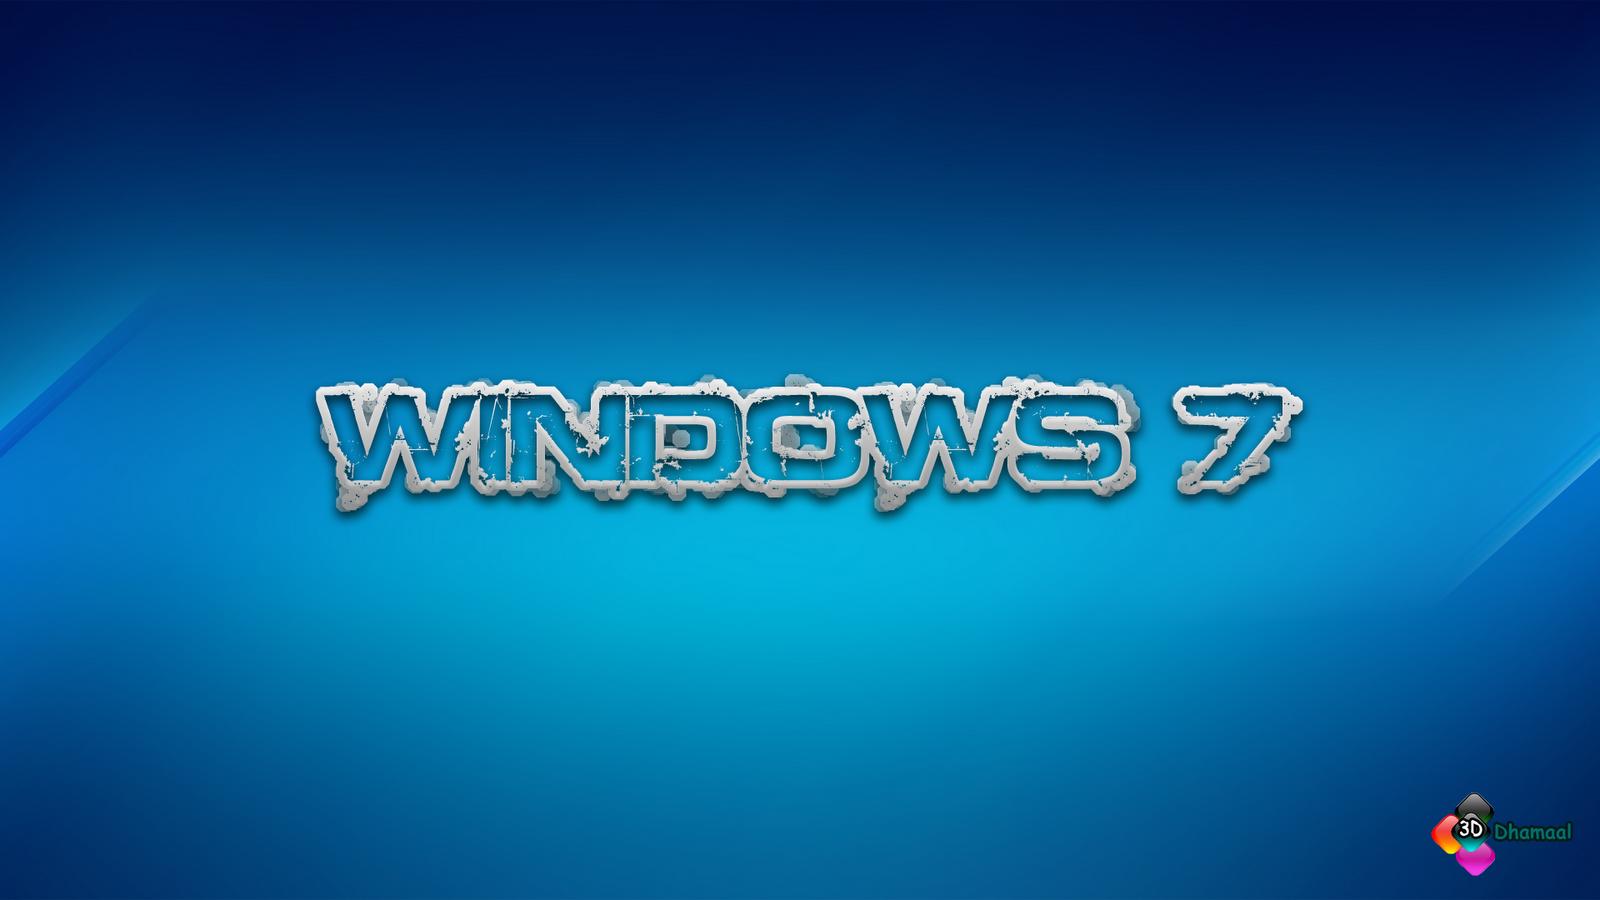 Cool Windows 7 Wallpaper HD